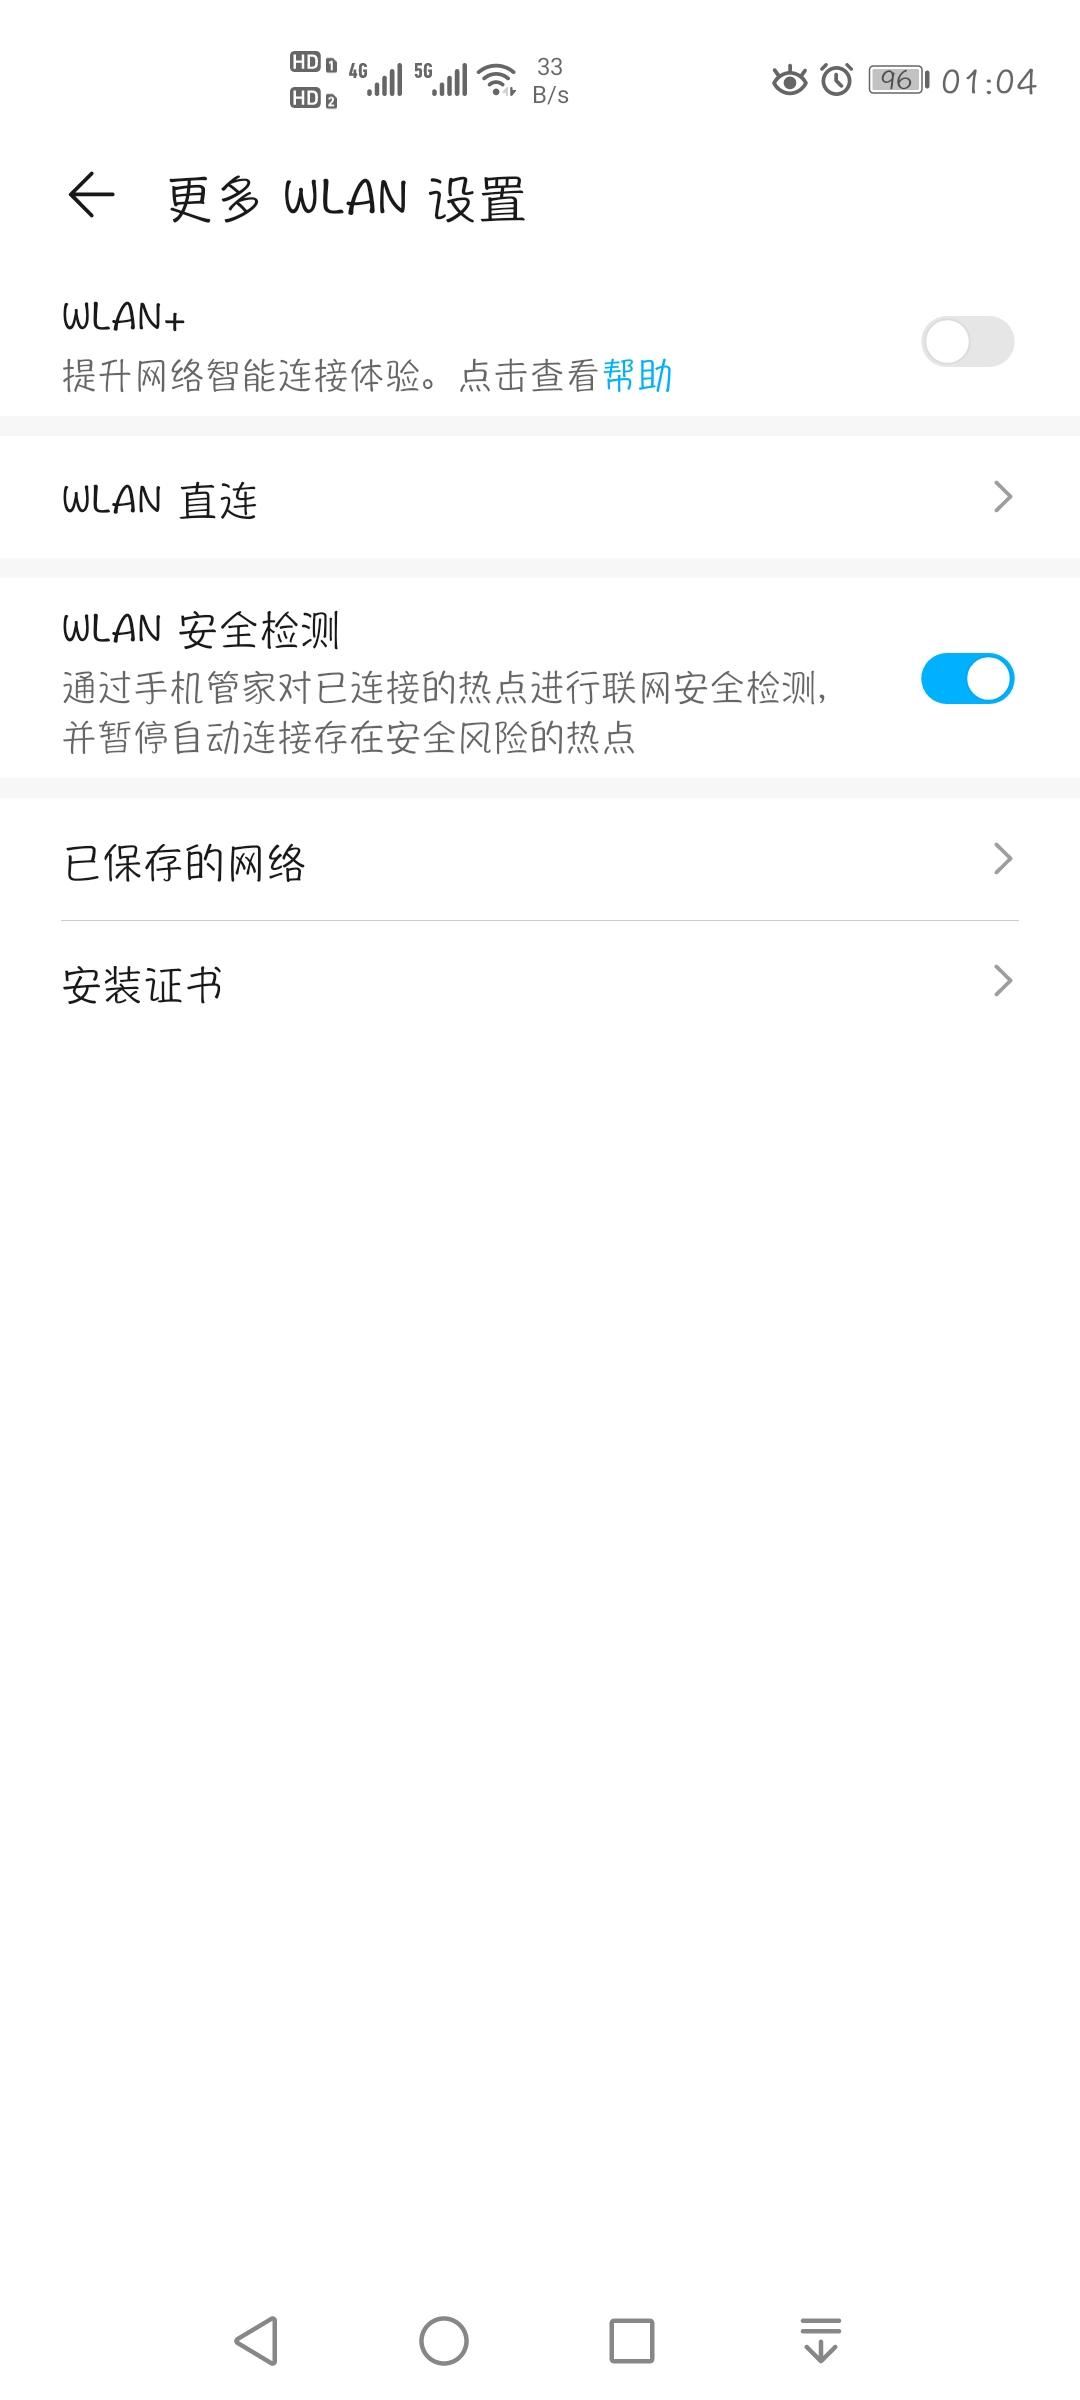 Screenshot_20191210_010425_com.android.settings.jpg